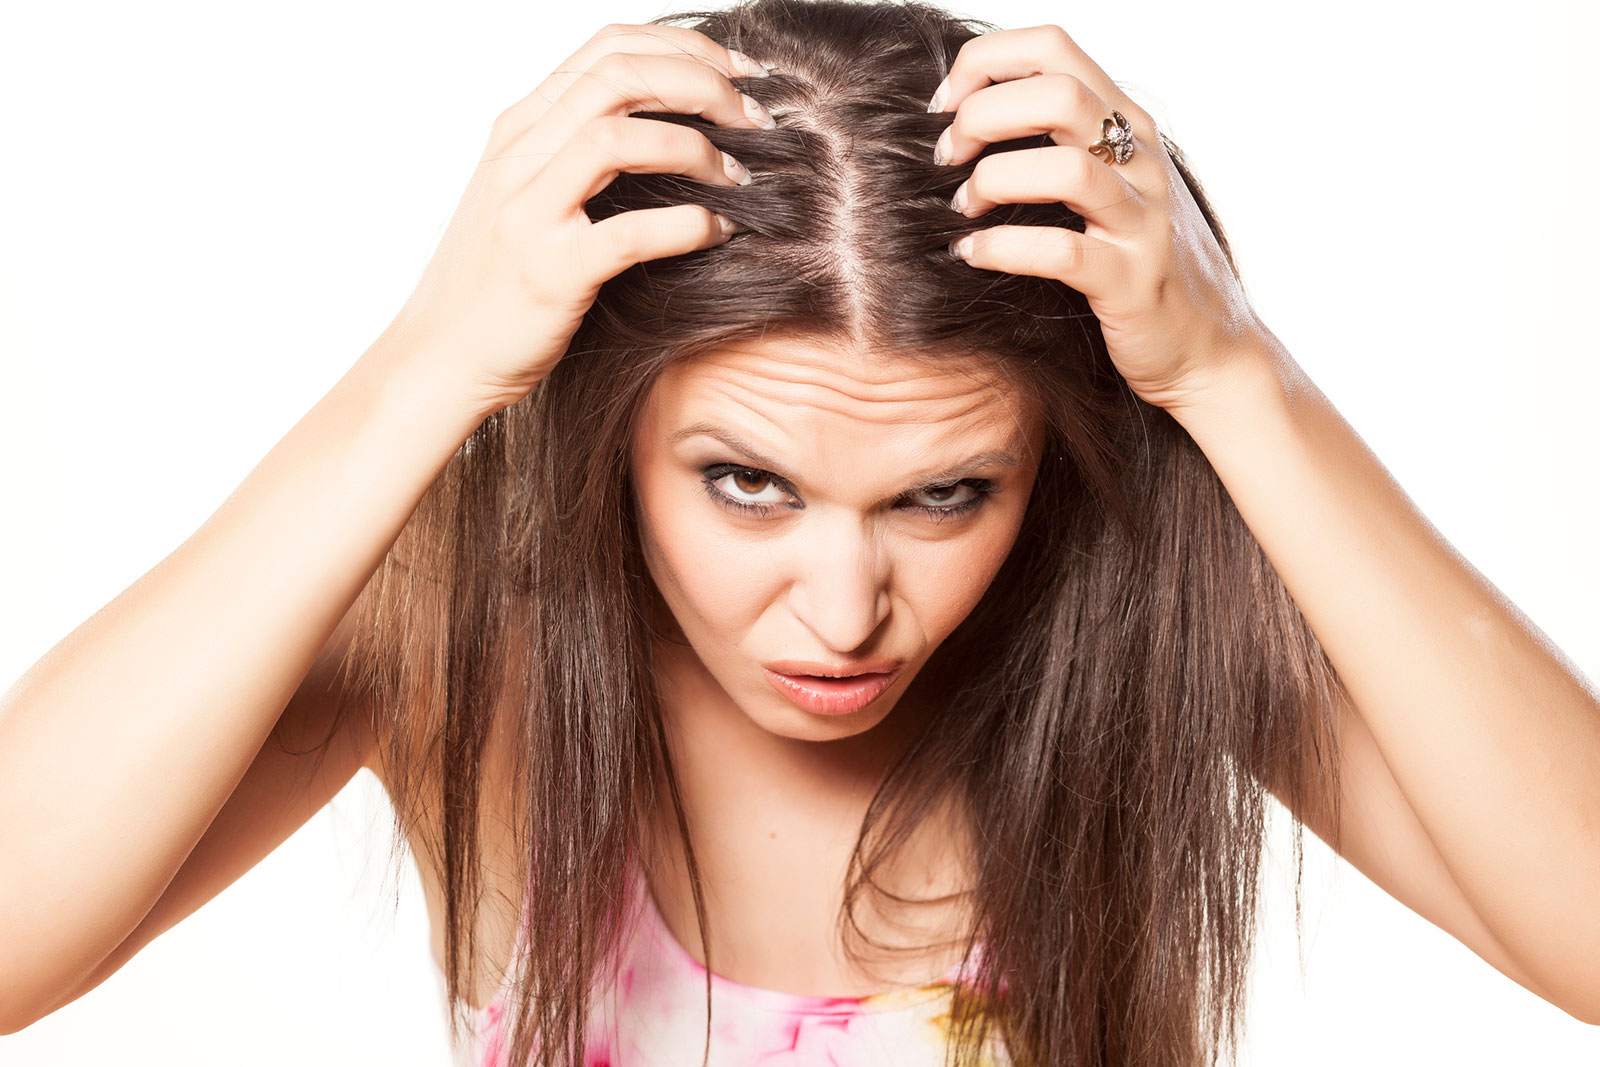 Hair Follicles Clogged By Sebum